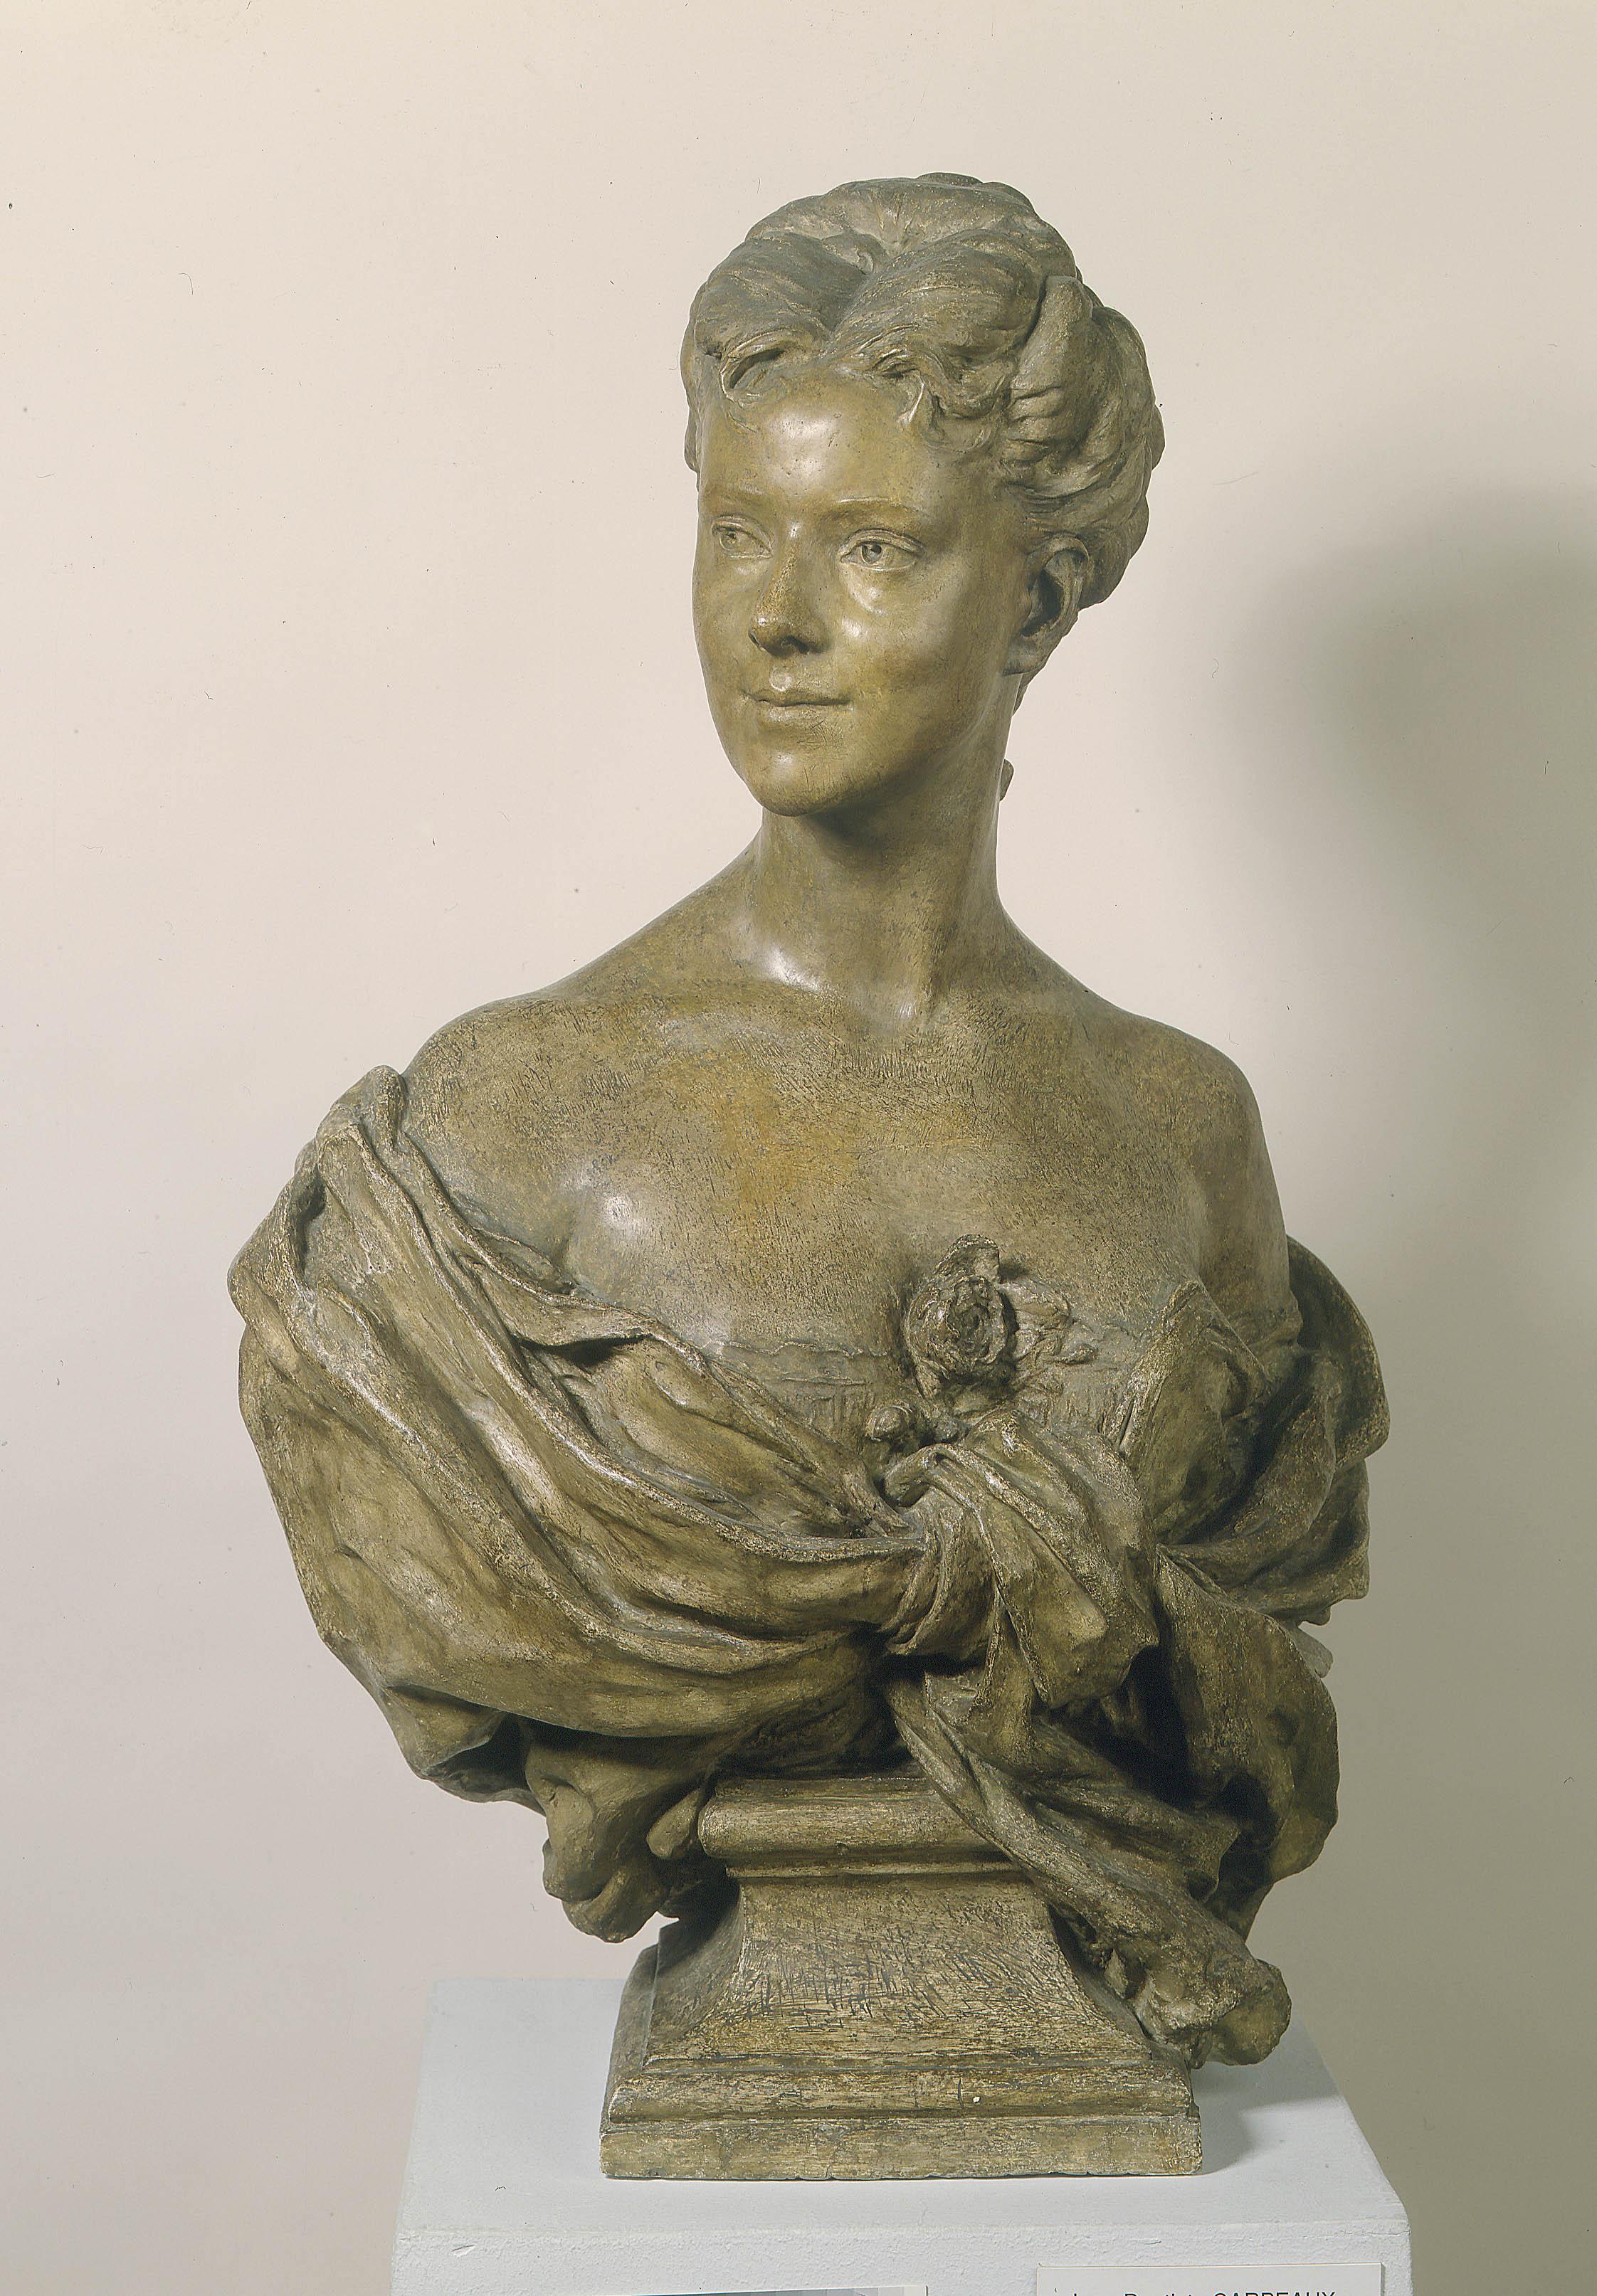 Jean-Baptiste Carpeaux - Mademoiselle Fiocre